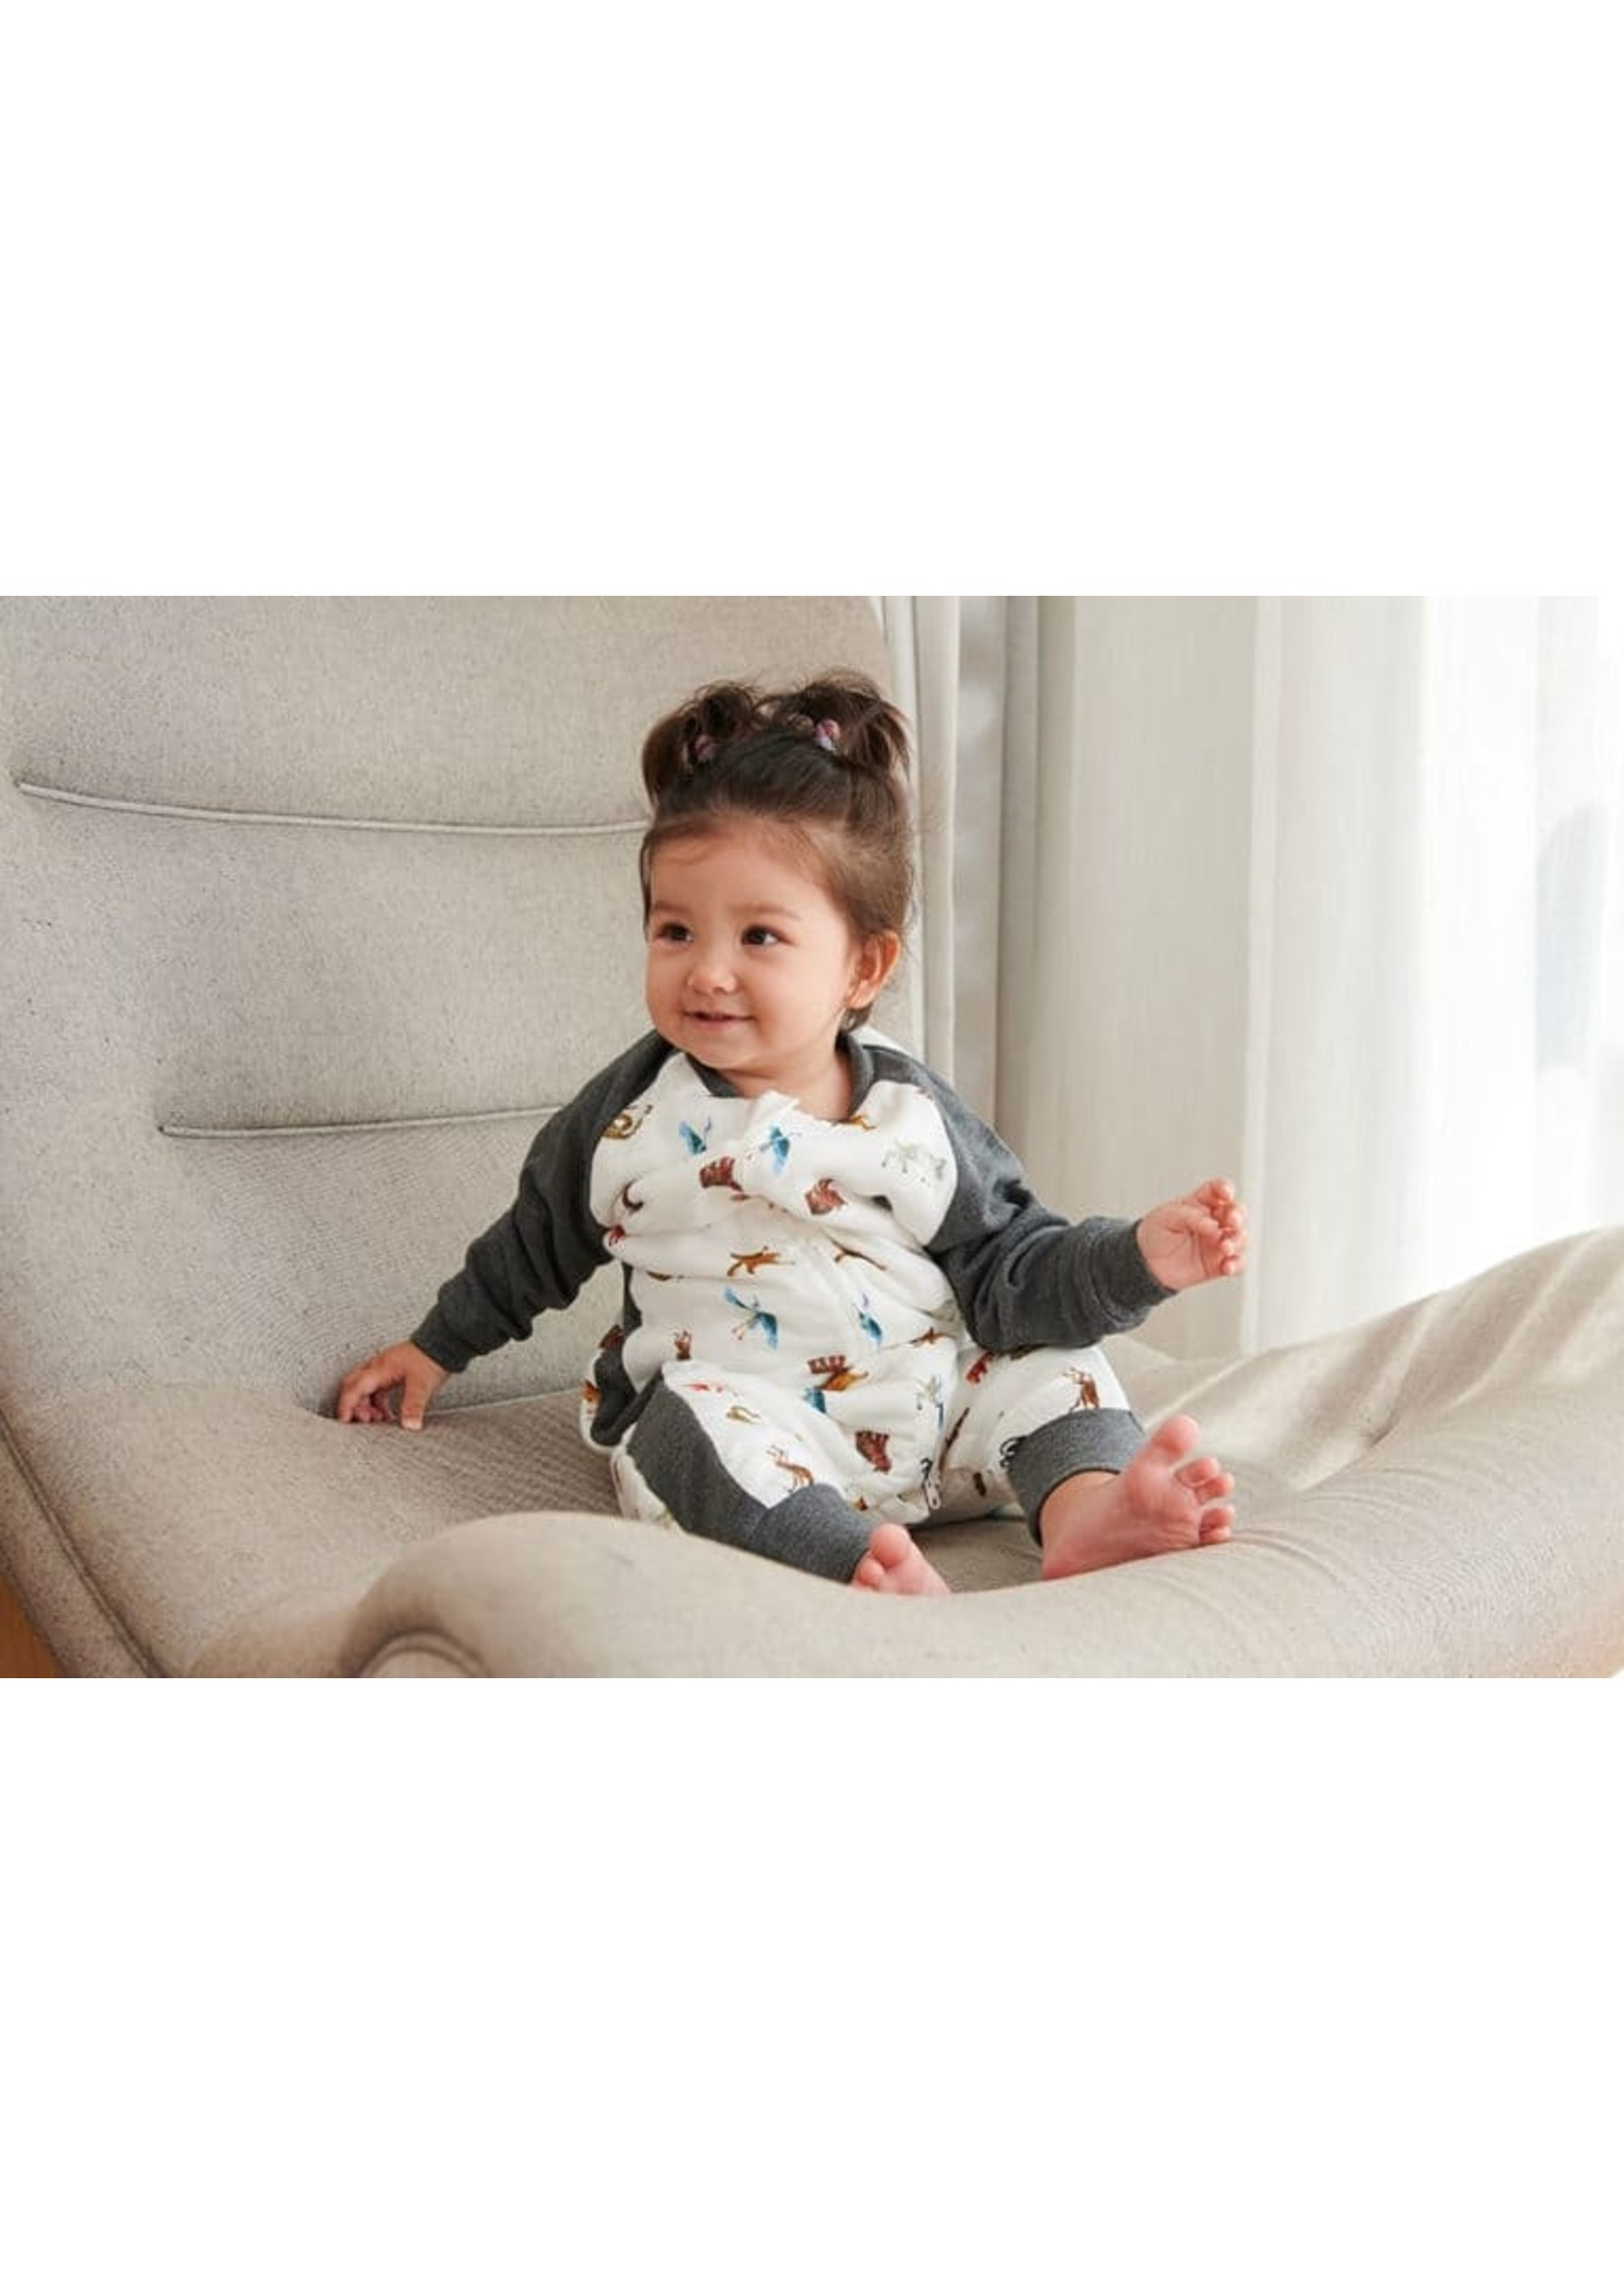 Nest Design ND 2.5 Sleep Suit (Baby Bear- Longsleeve)